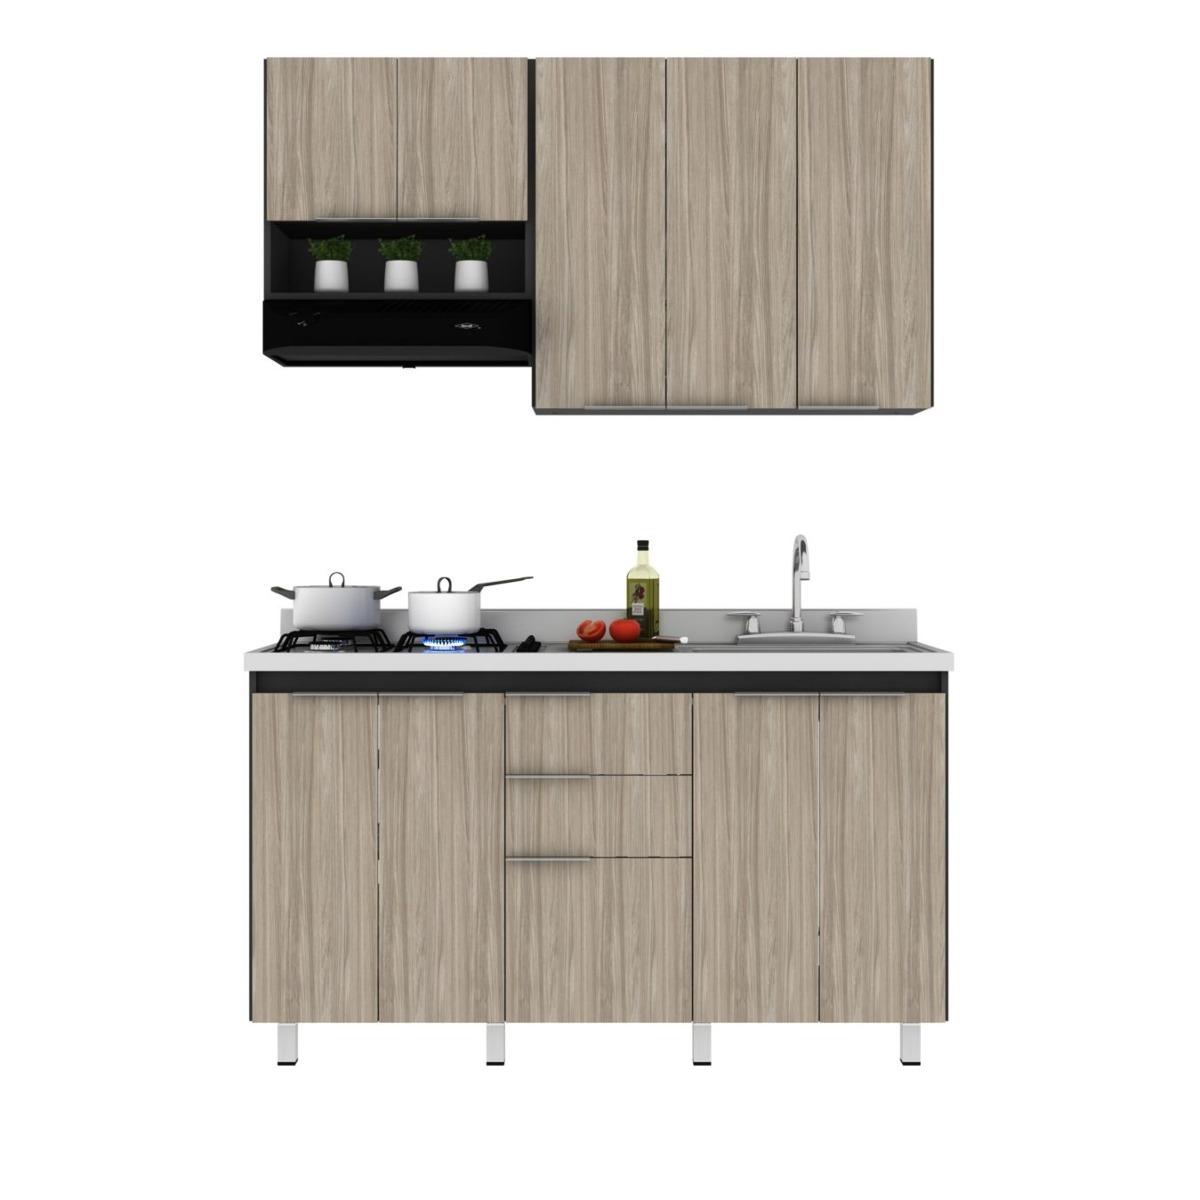 practimac cocina integral aroca metros 9 puertas 3 On cocina integral 3 metros